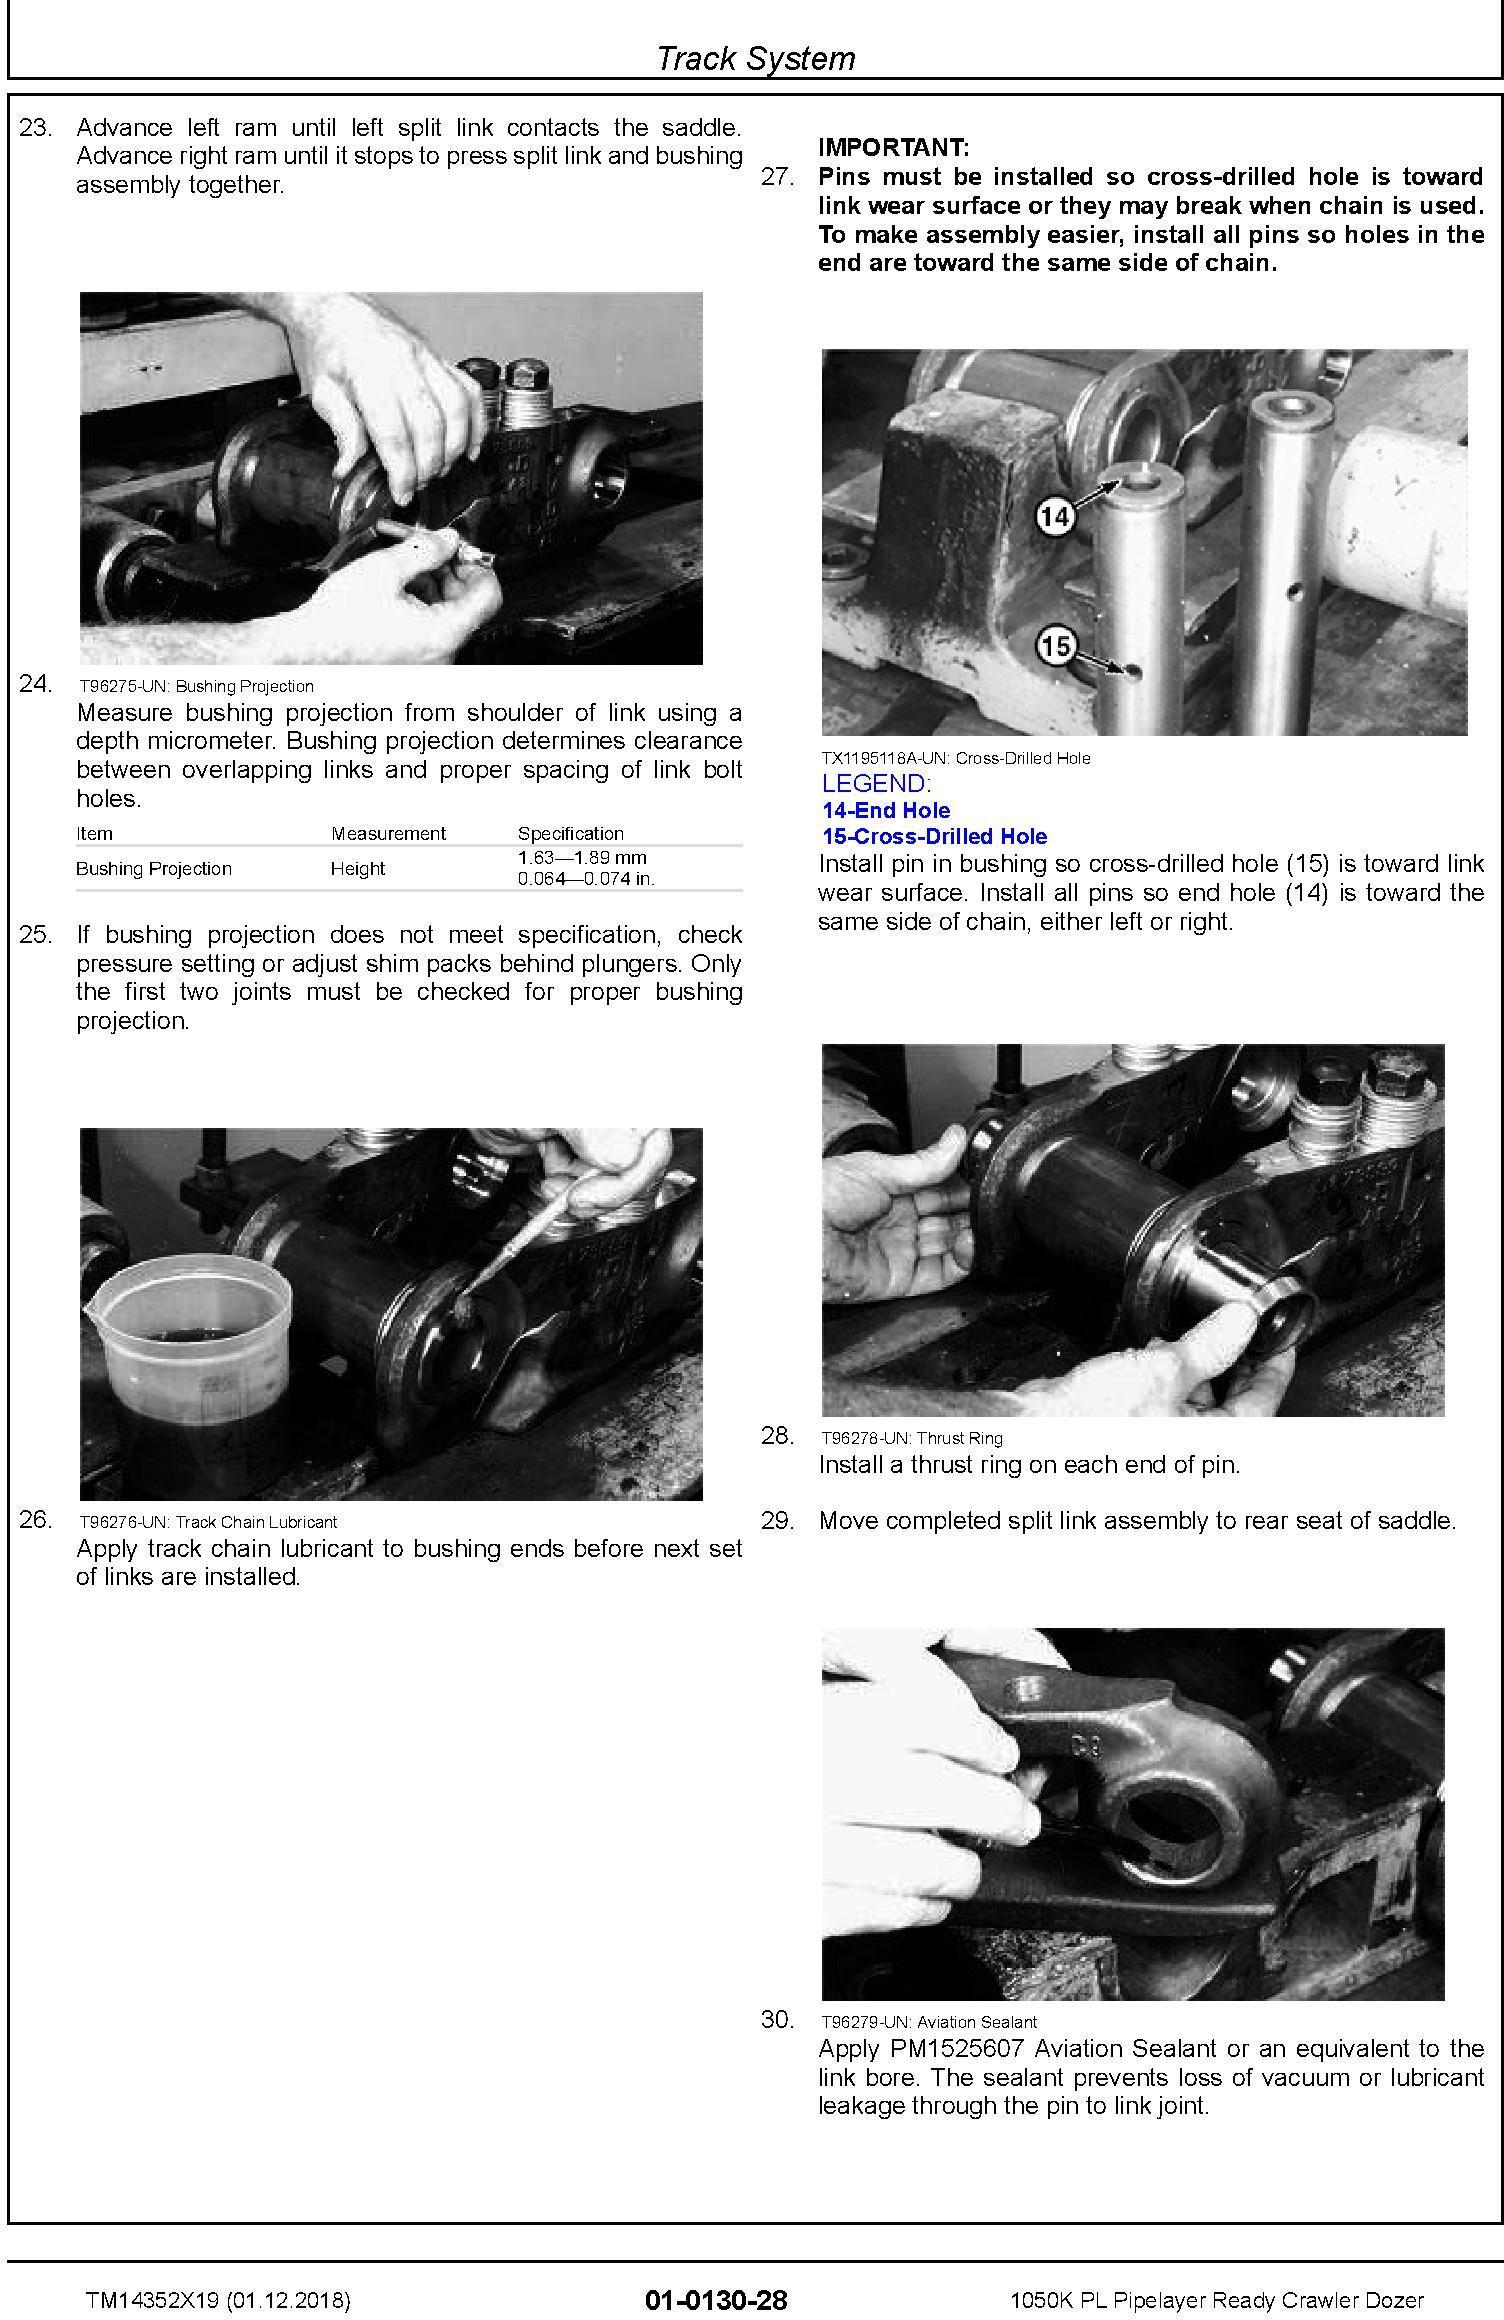 John Deere 1050K PL (SN.F318802-) Pipelayer Ready Crawler Dozer Repair Technical Manual (TM14352X19) - 2